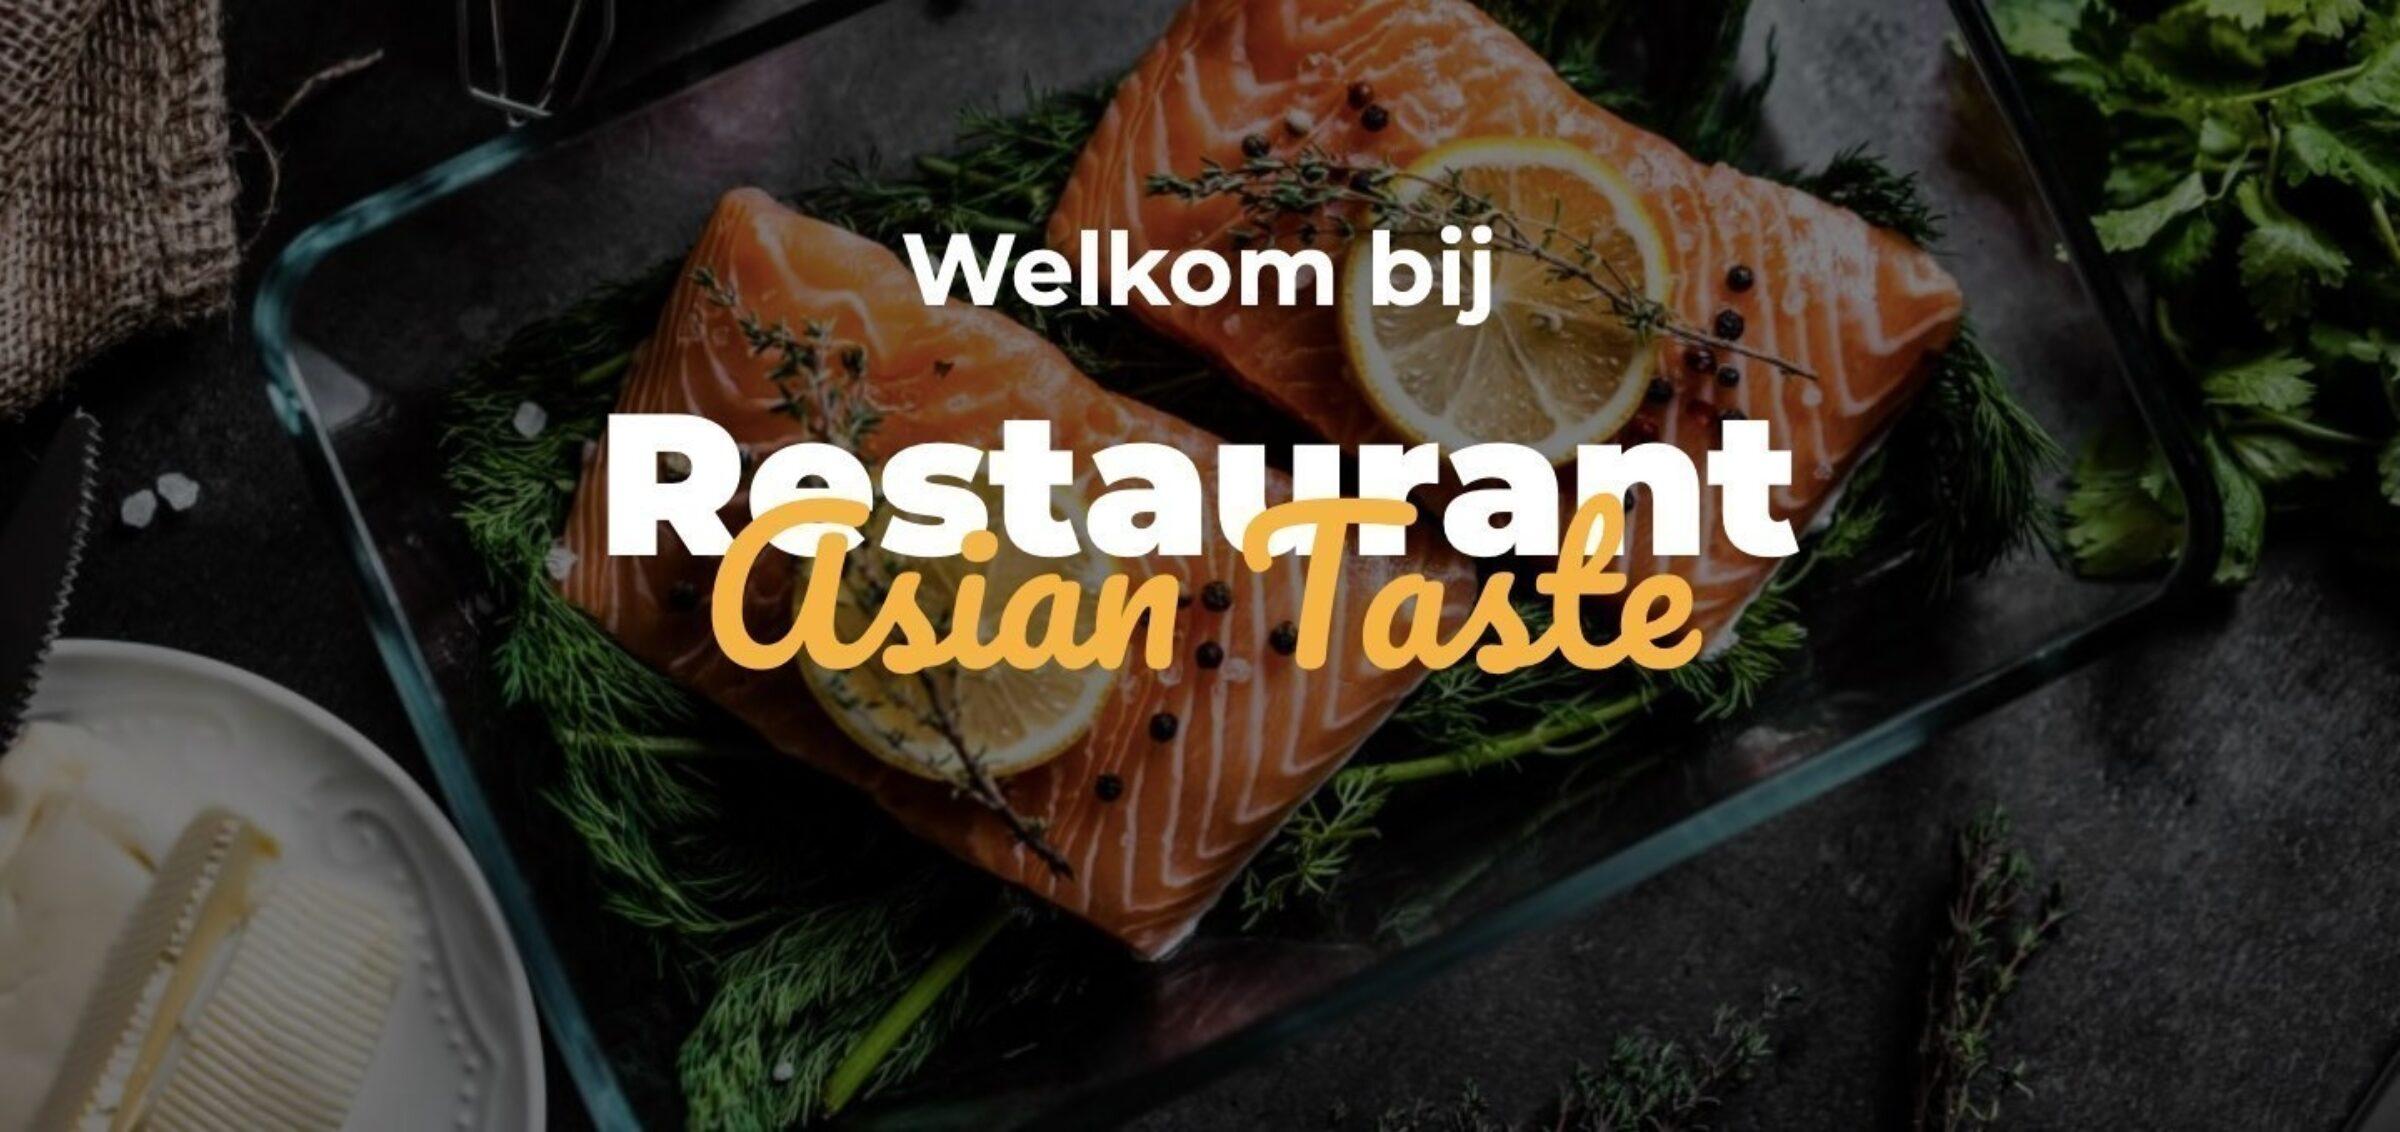 Asian taste 3857 1580821428 35i1xy7y9p